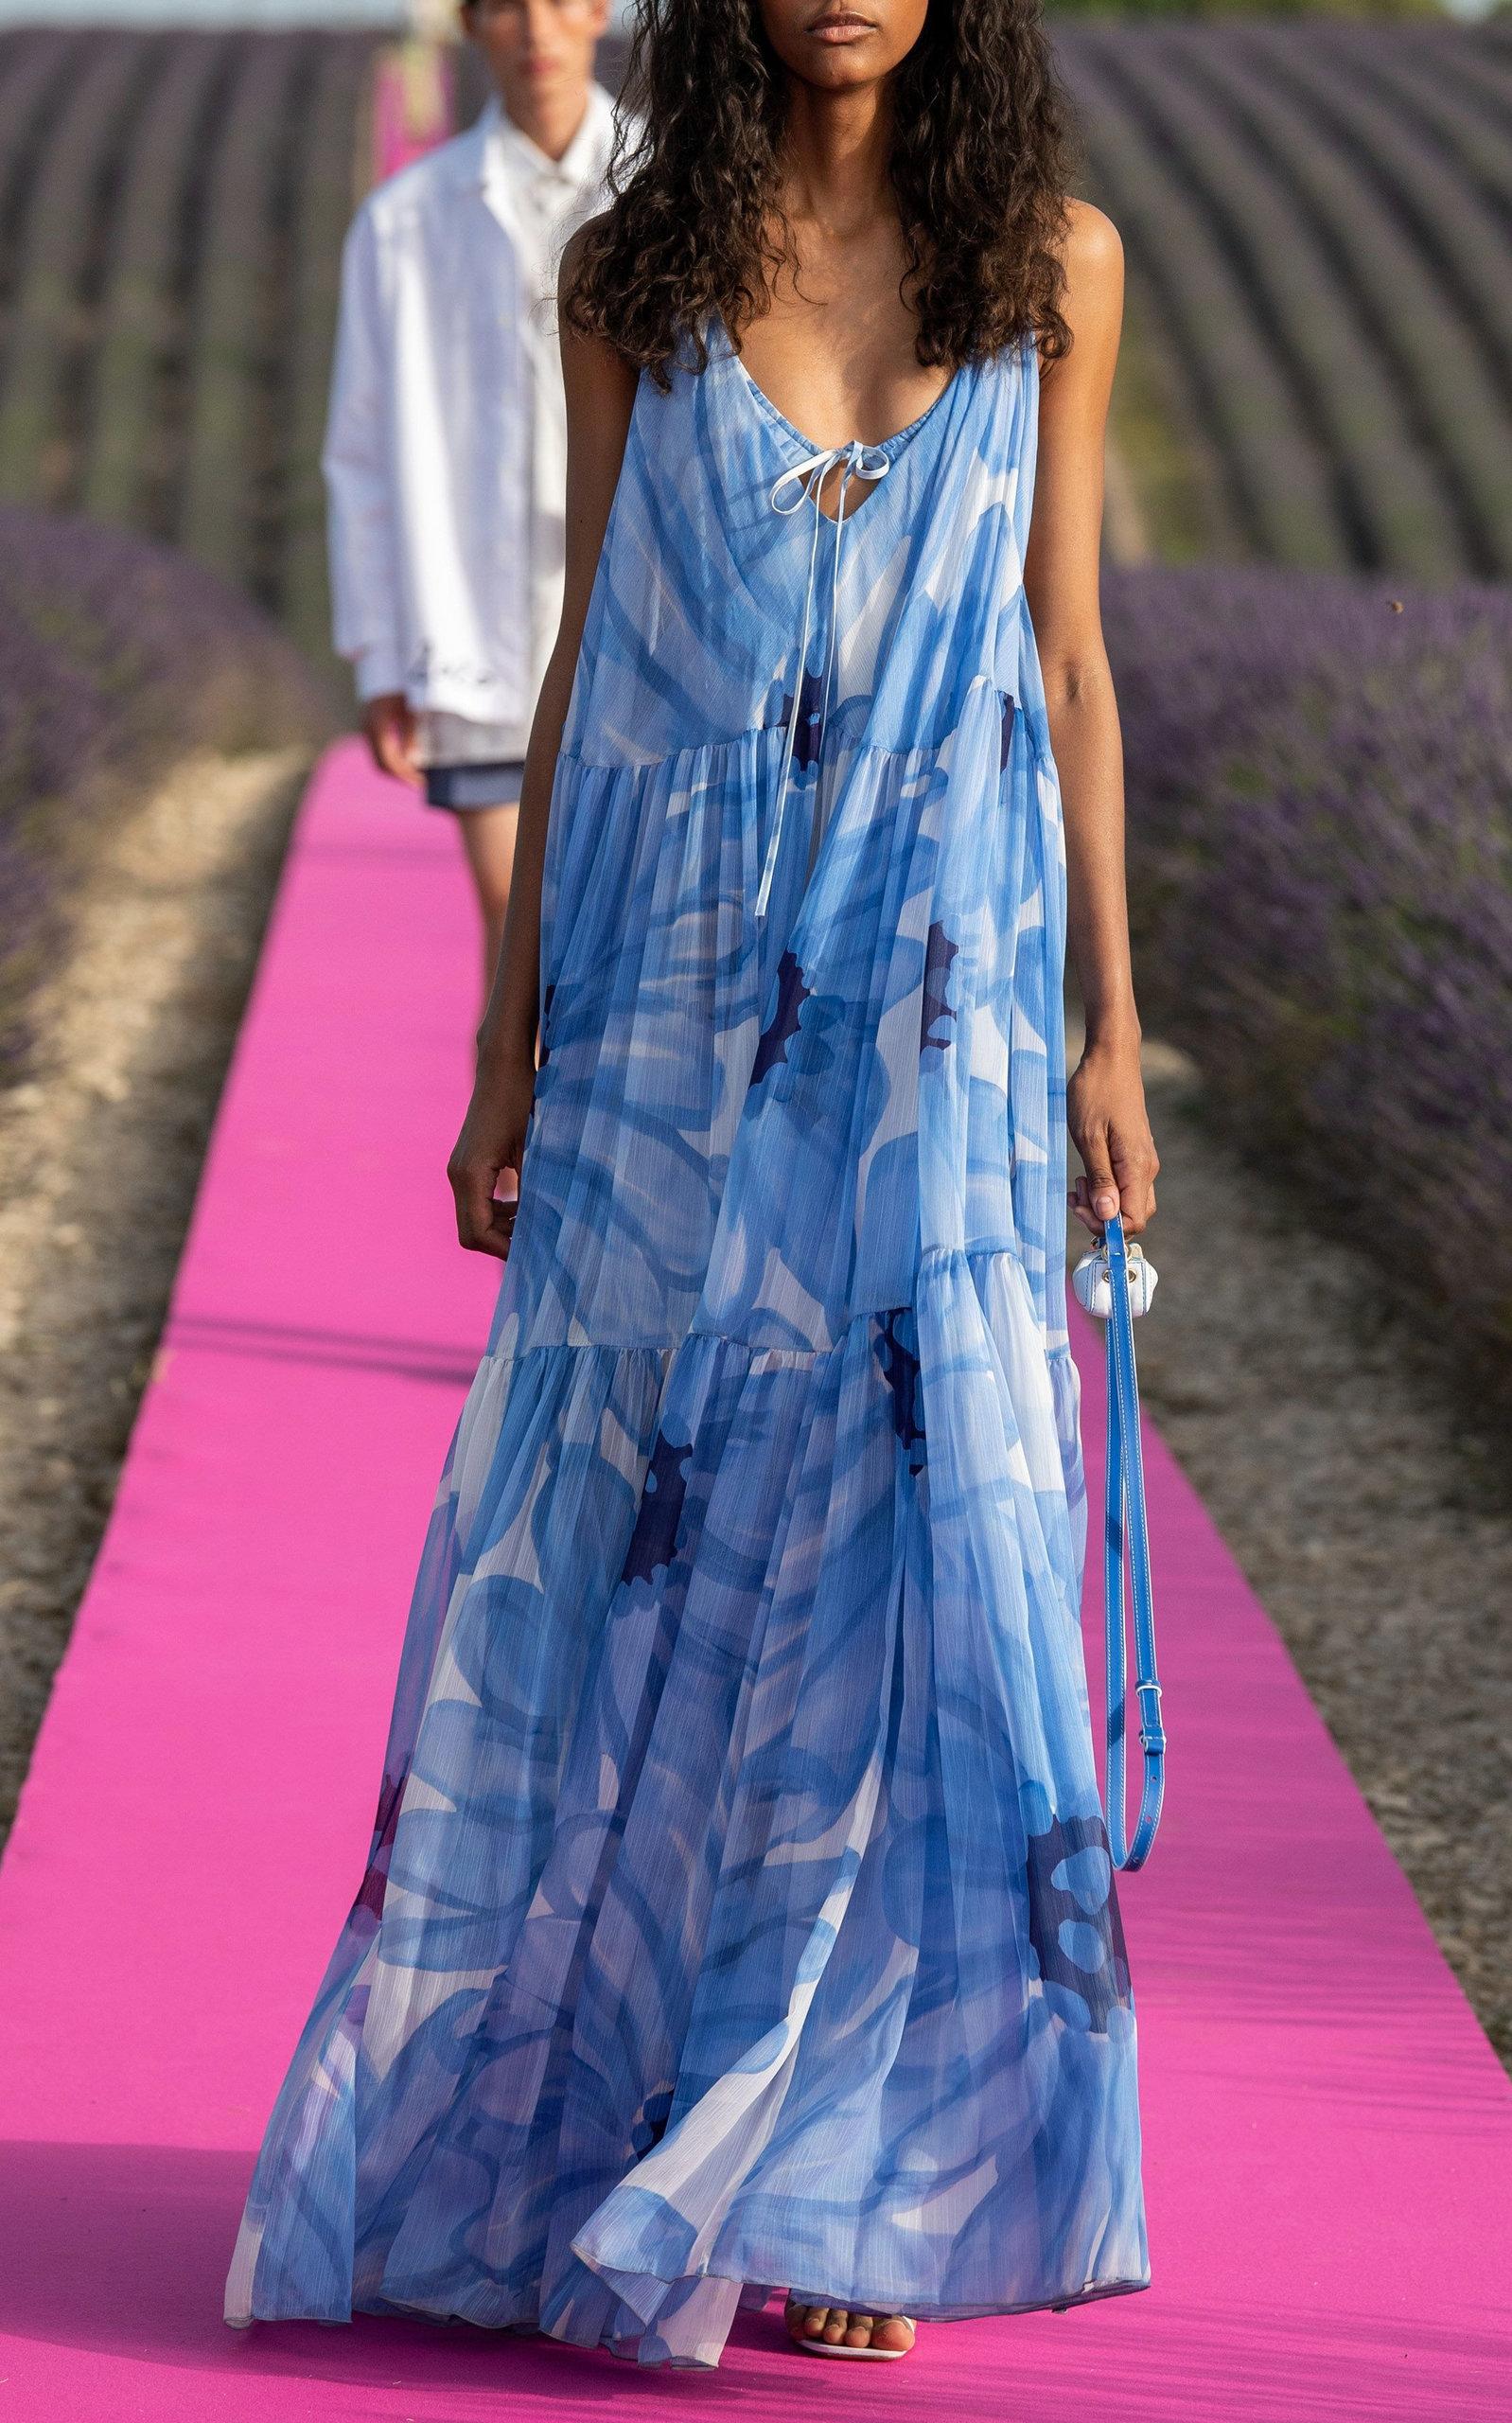 Jacquemus Le Nani Leather Bag Jacquemus Bags Leather Floral Print Chiffon Maxi Dress Maxi Dress Fashion [ 2560 x 1598 Pixel ]